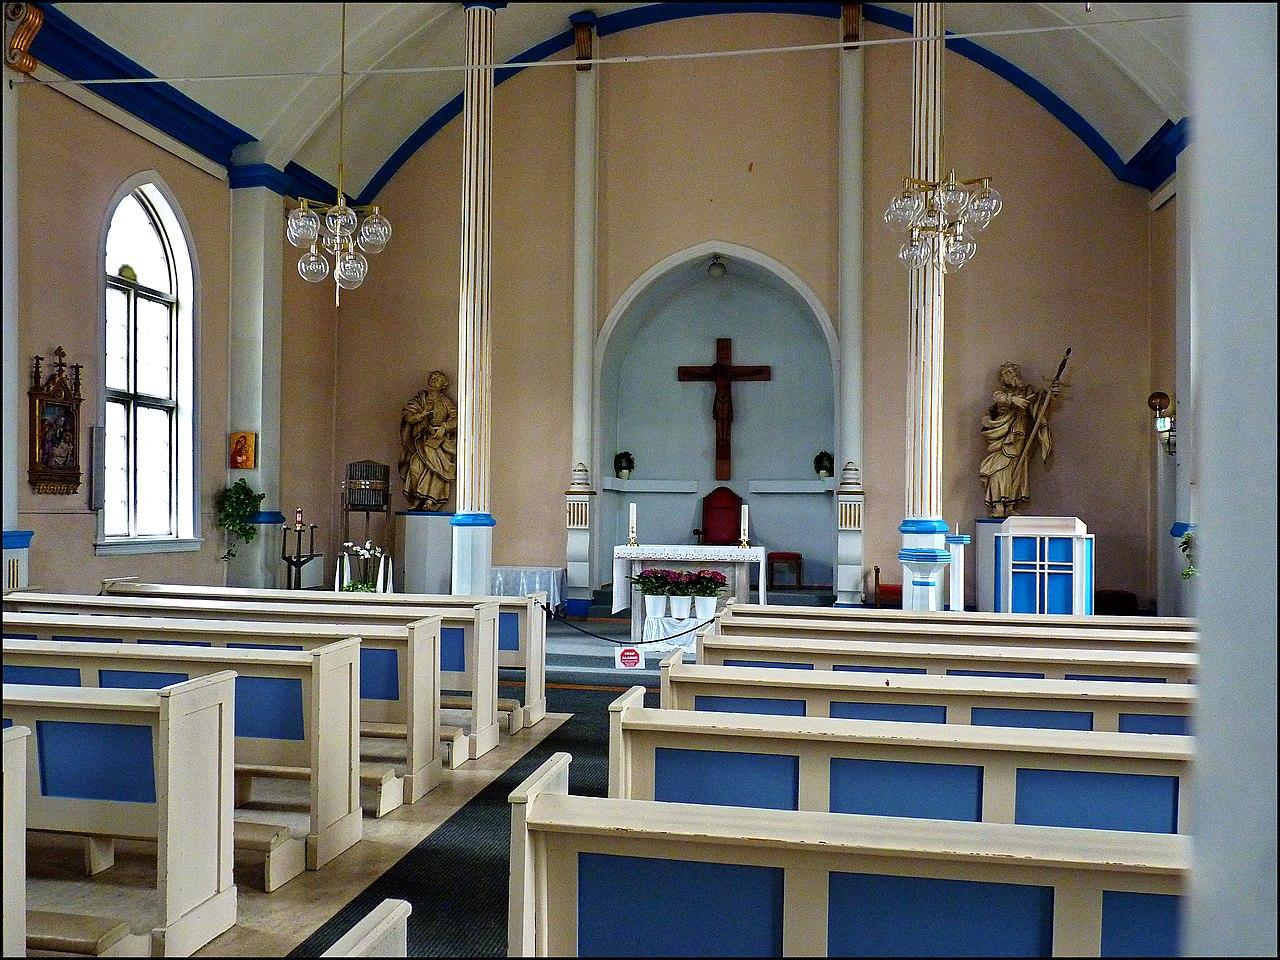 katolsk kirke dating site dating en mand med voksne døtre